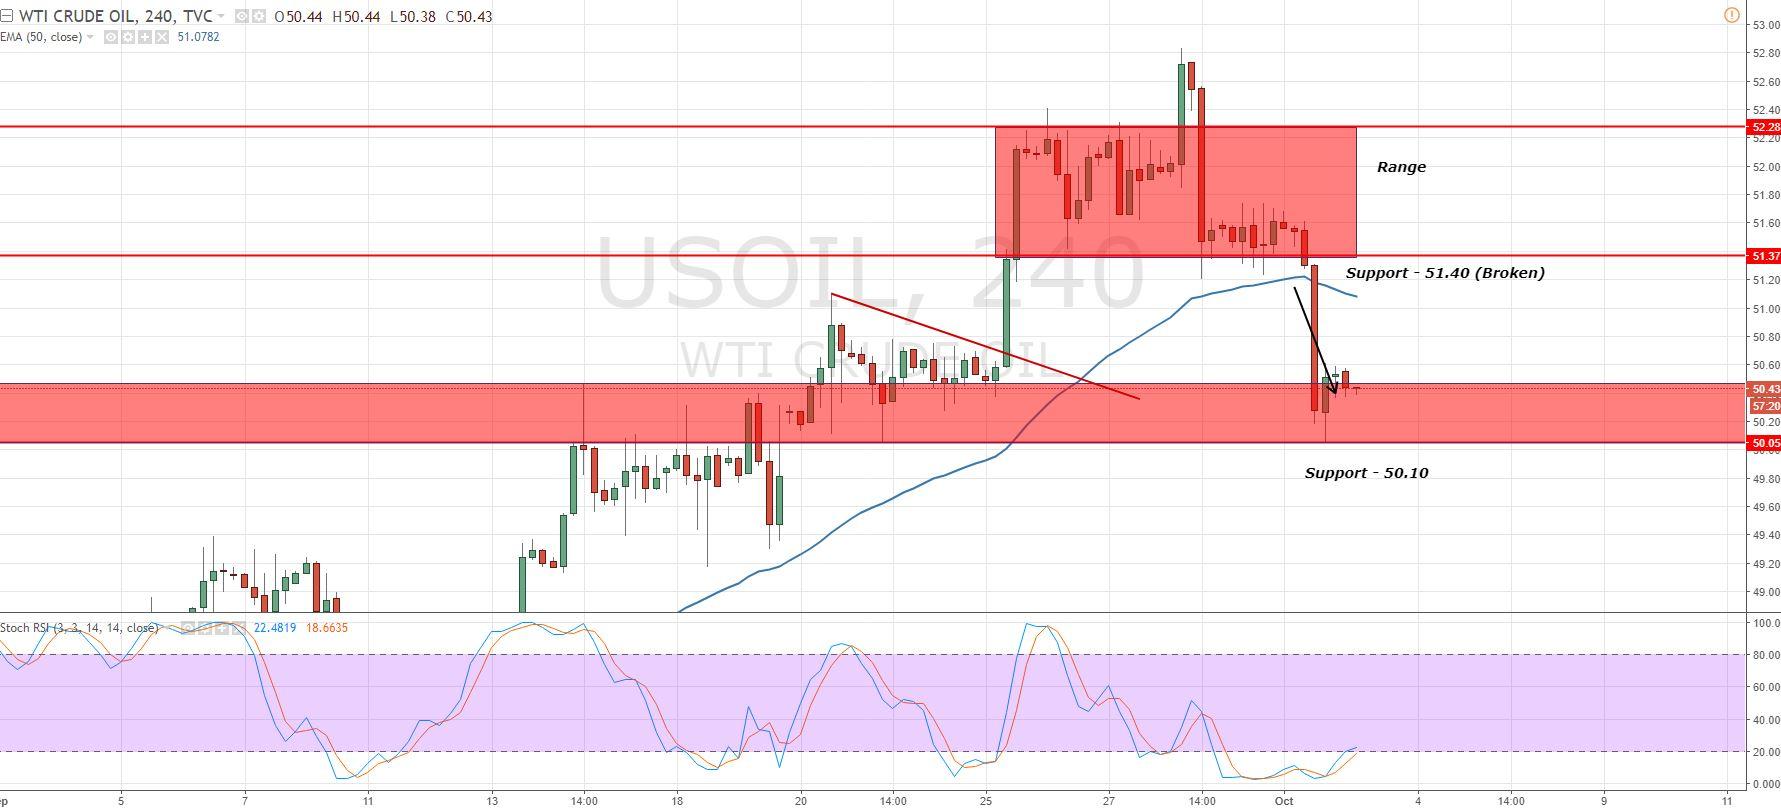 Crude Oil - 4 - Hour Chart - Range Breakout